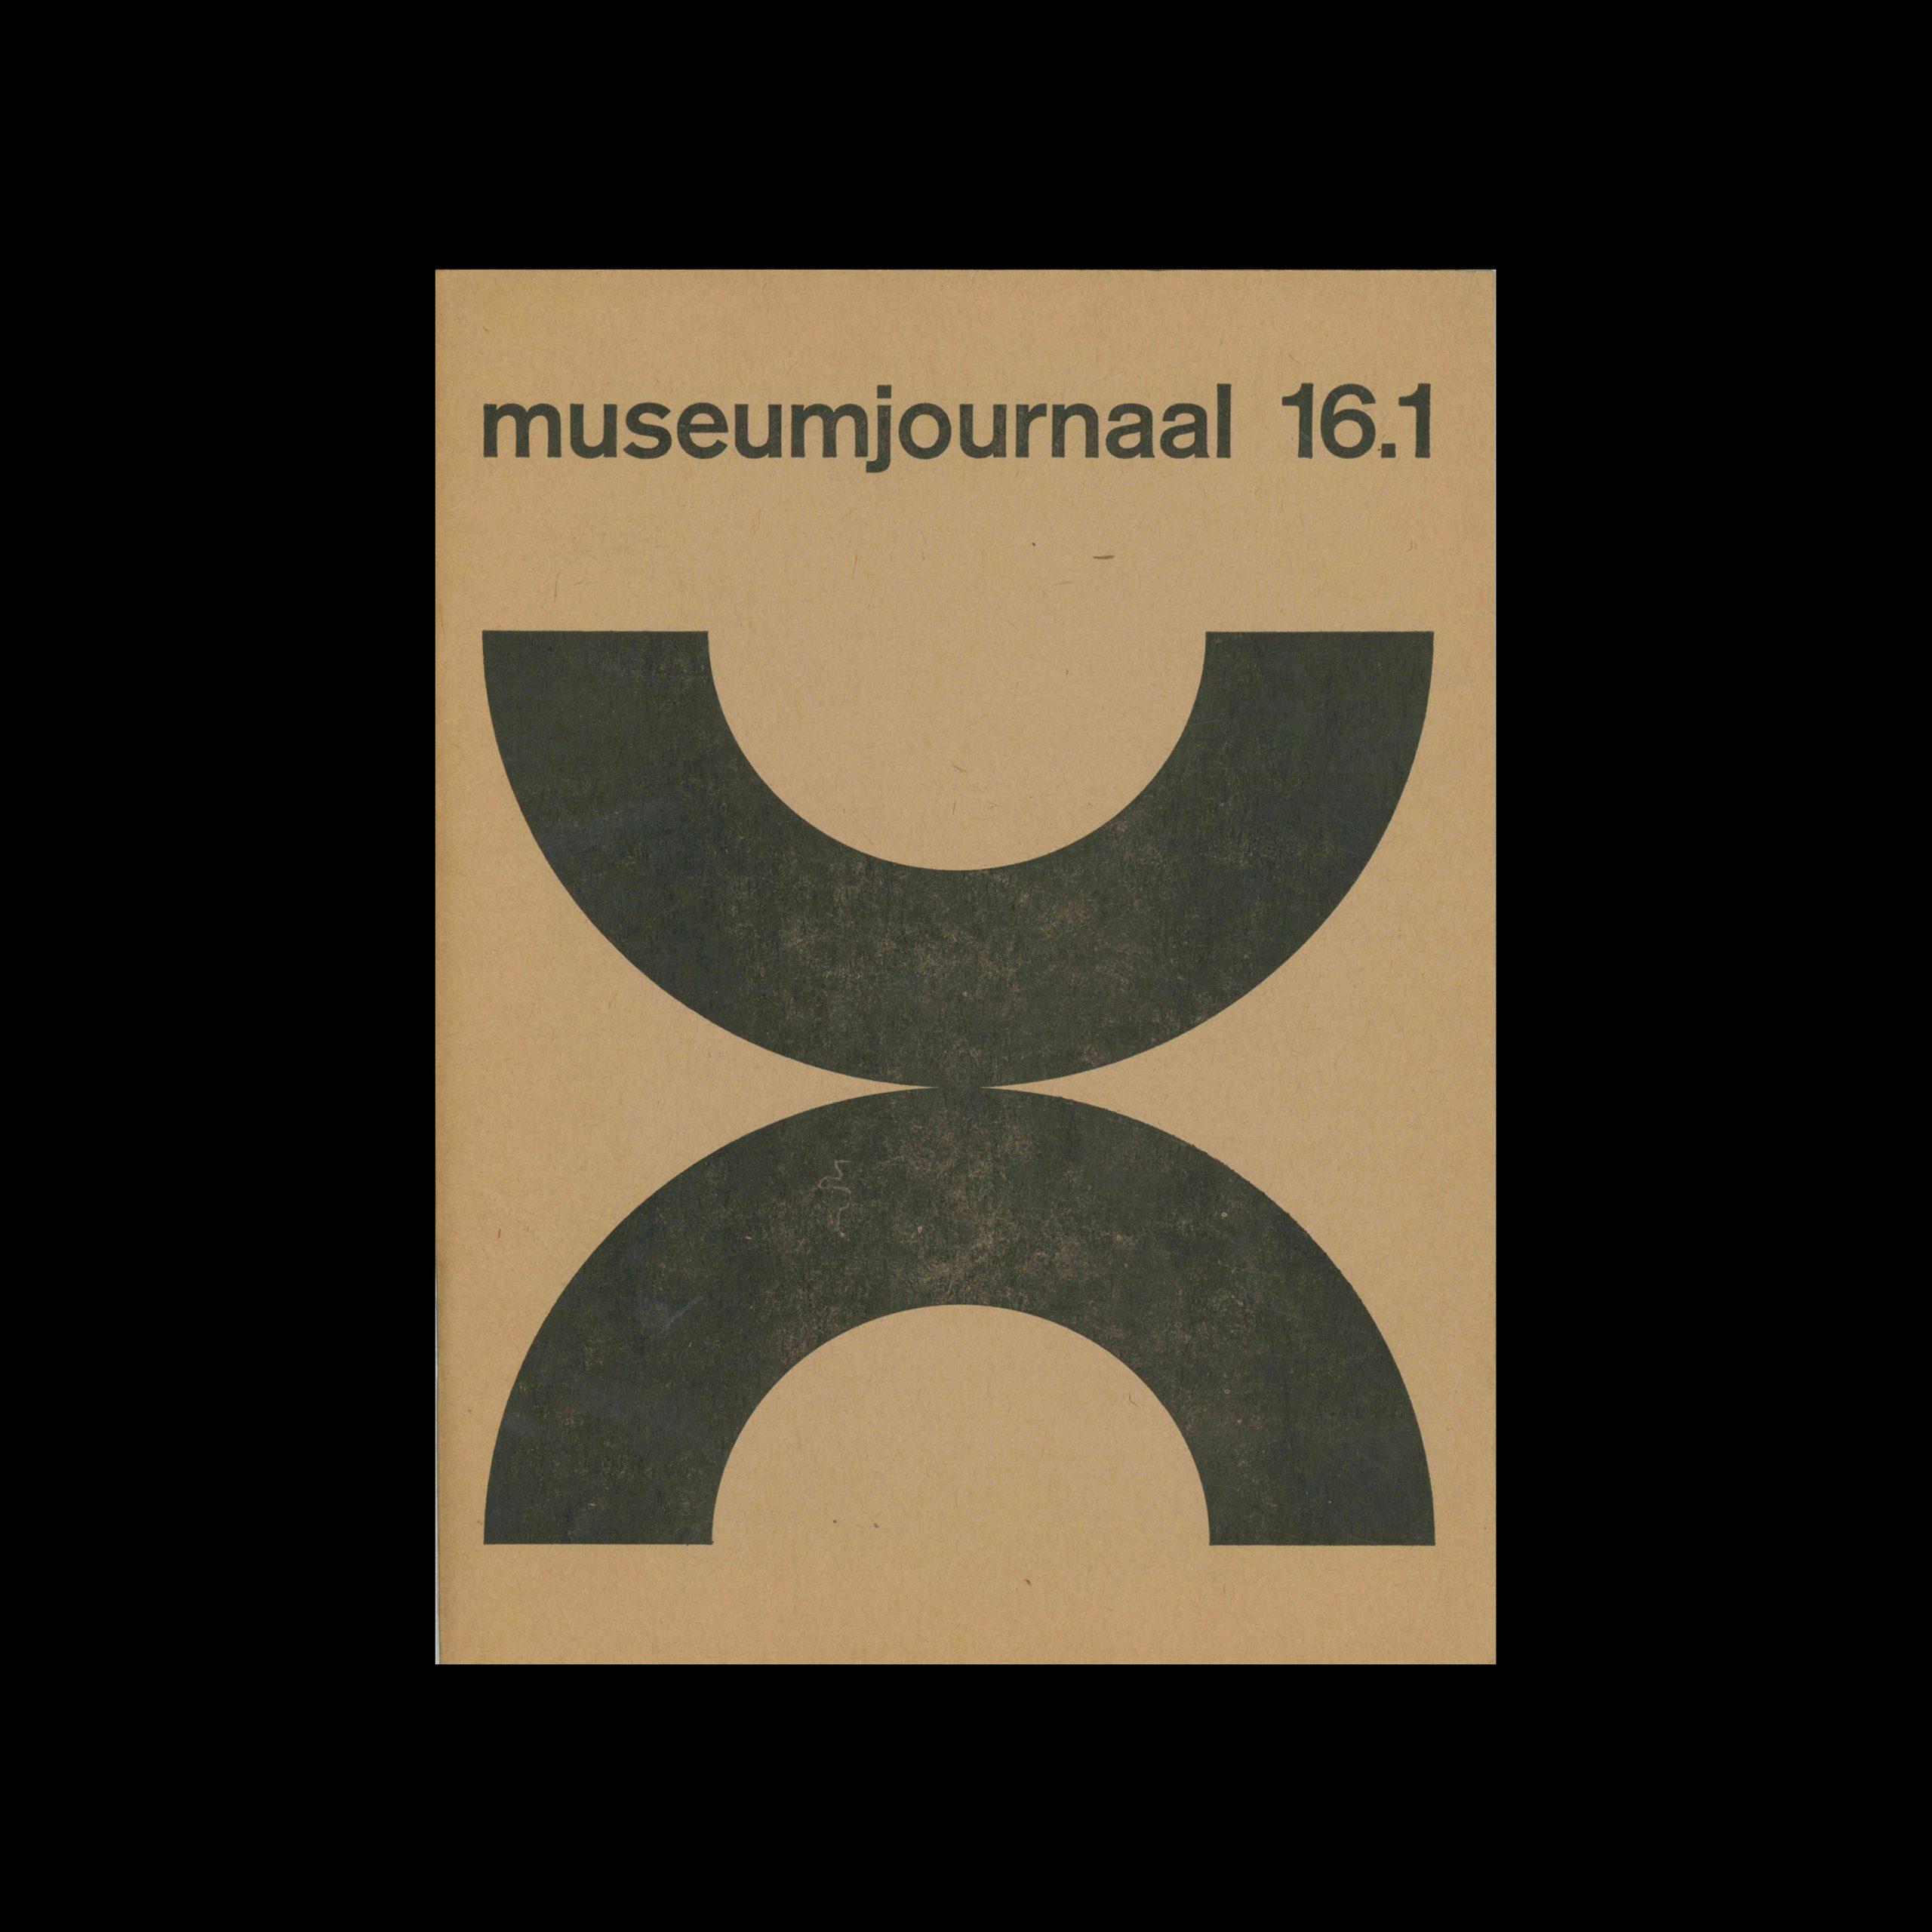 Museumjournaal, Serie 16 no1, 1971. Designed by Jurriaan Schrofer.